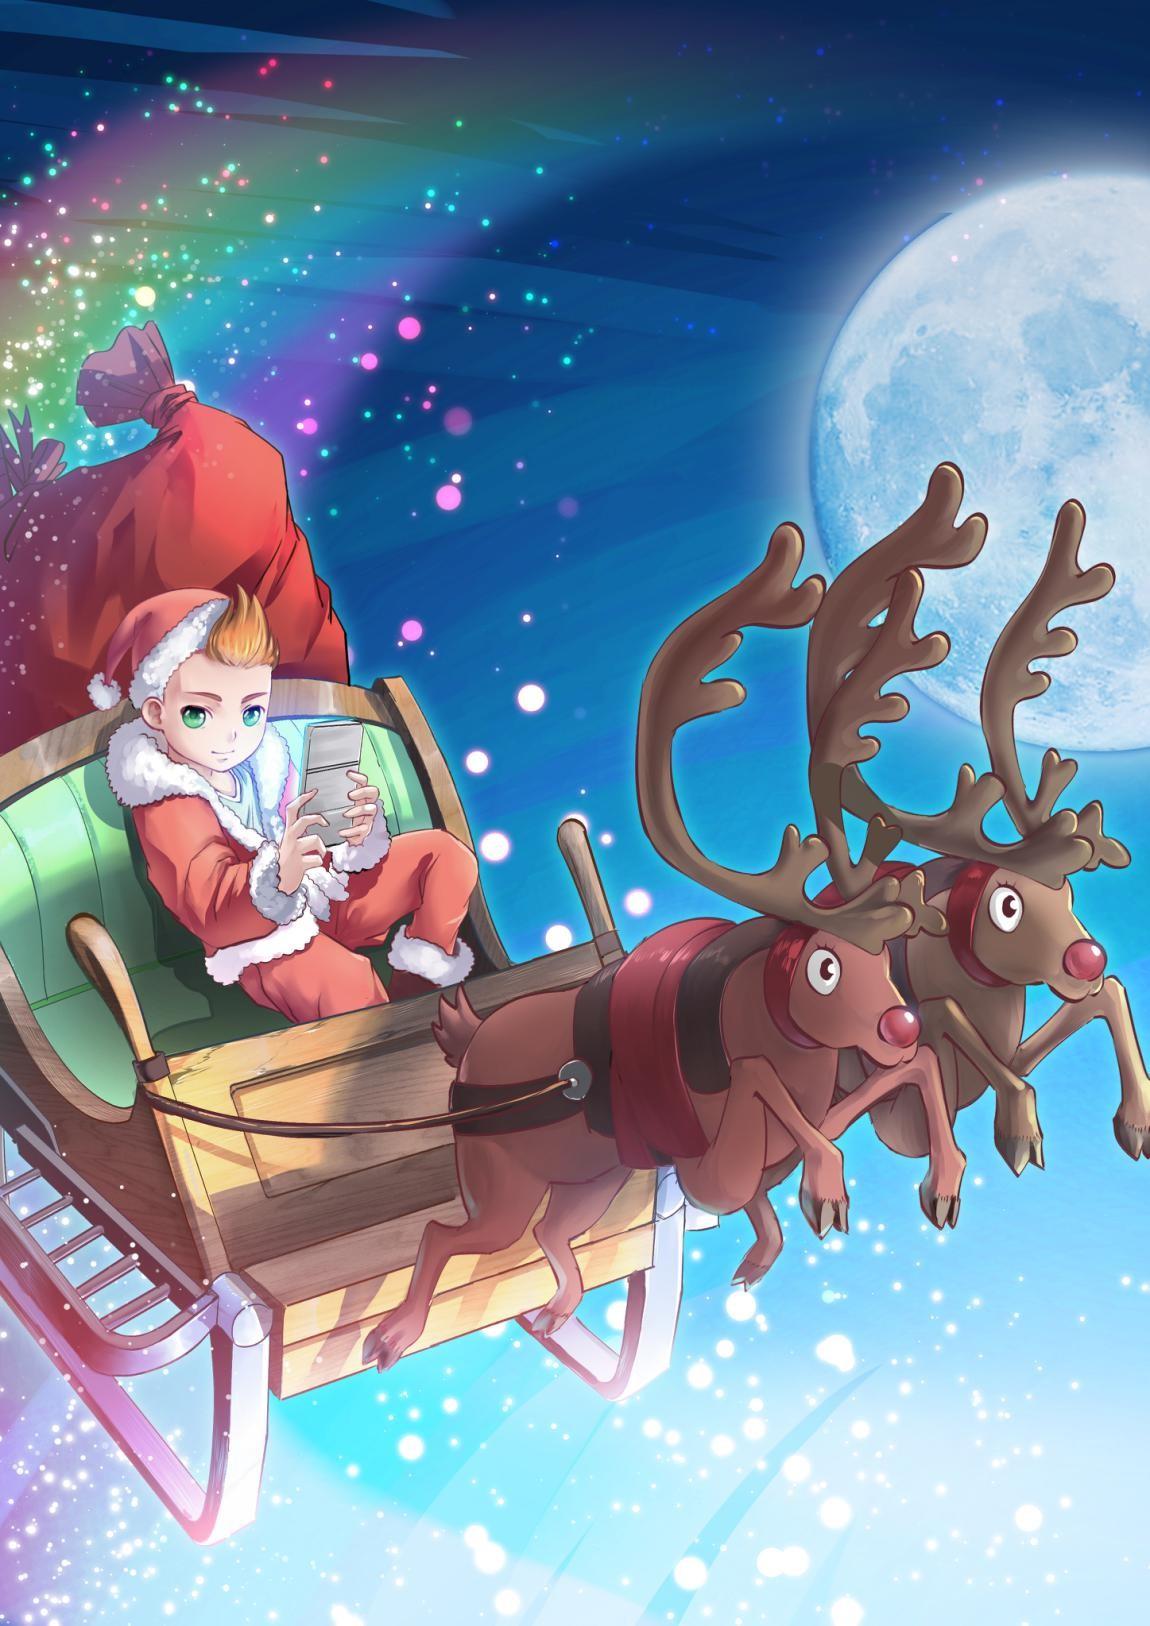 Merry Christmas!《瑞纳宝贝》祝大家圣诞快乐!